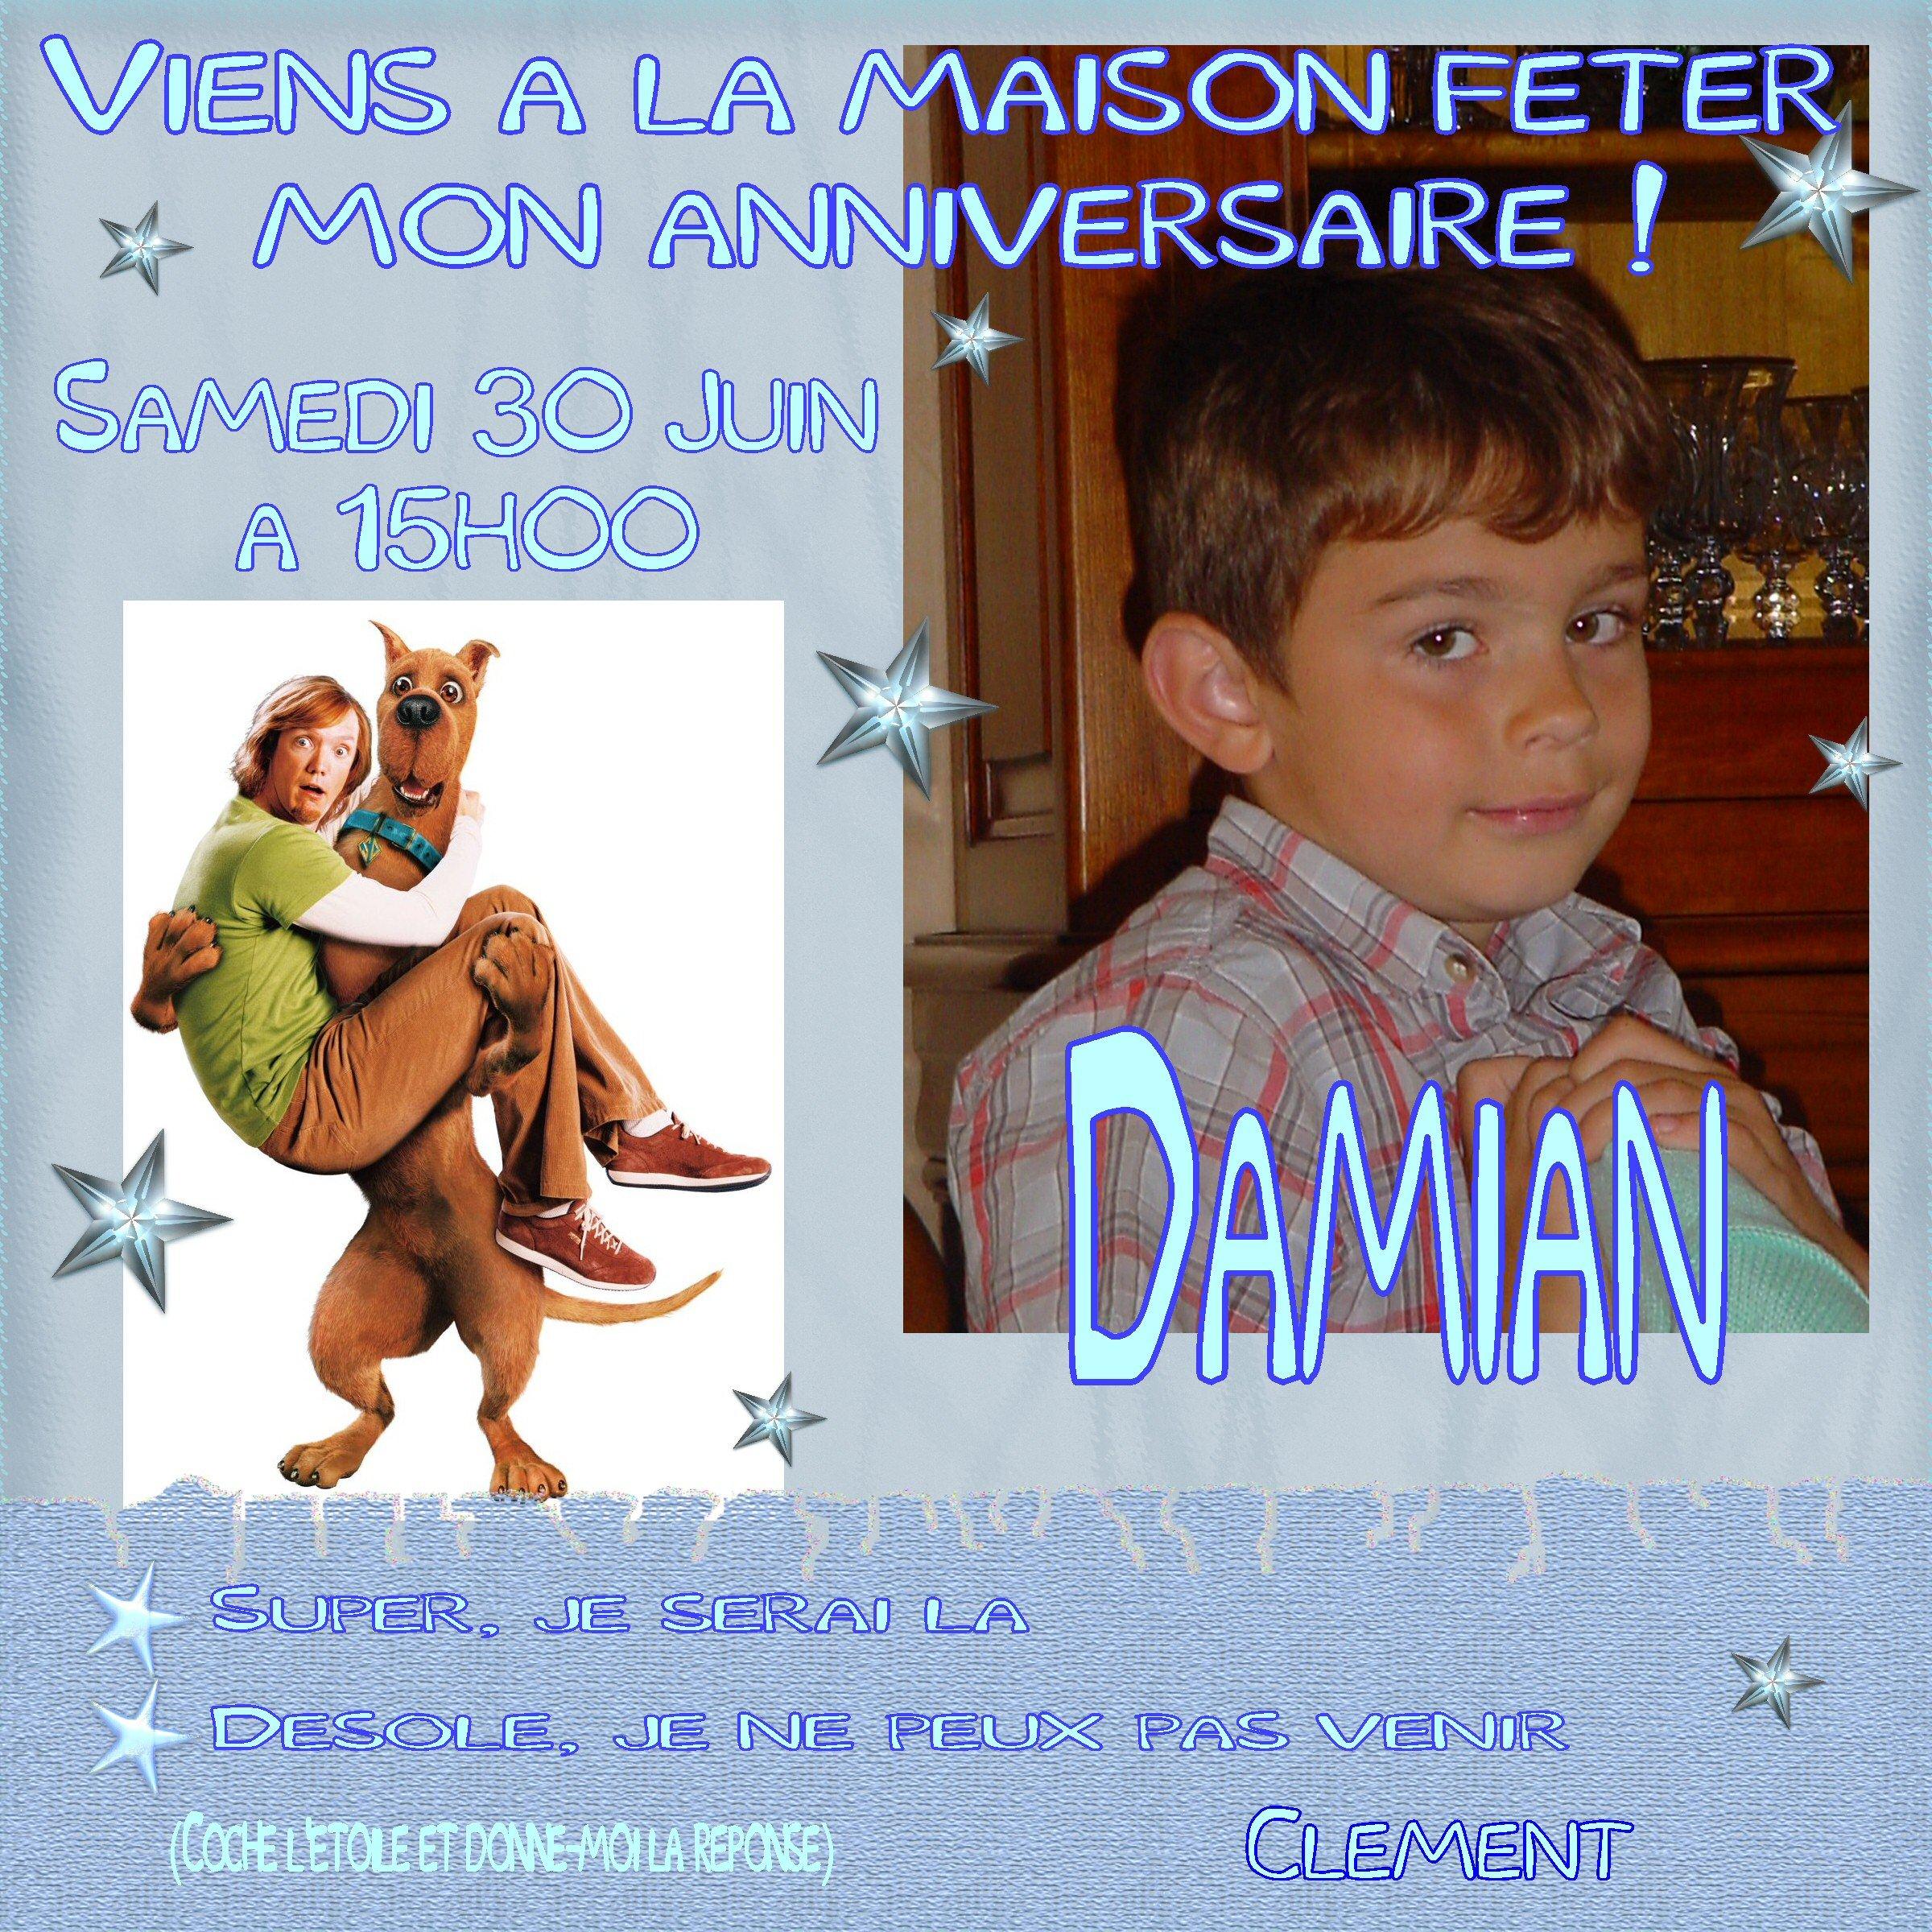 invit Damian